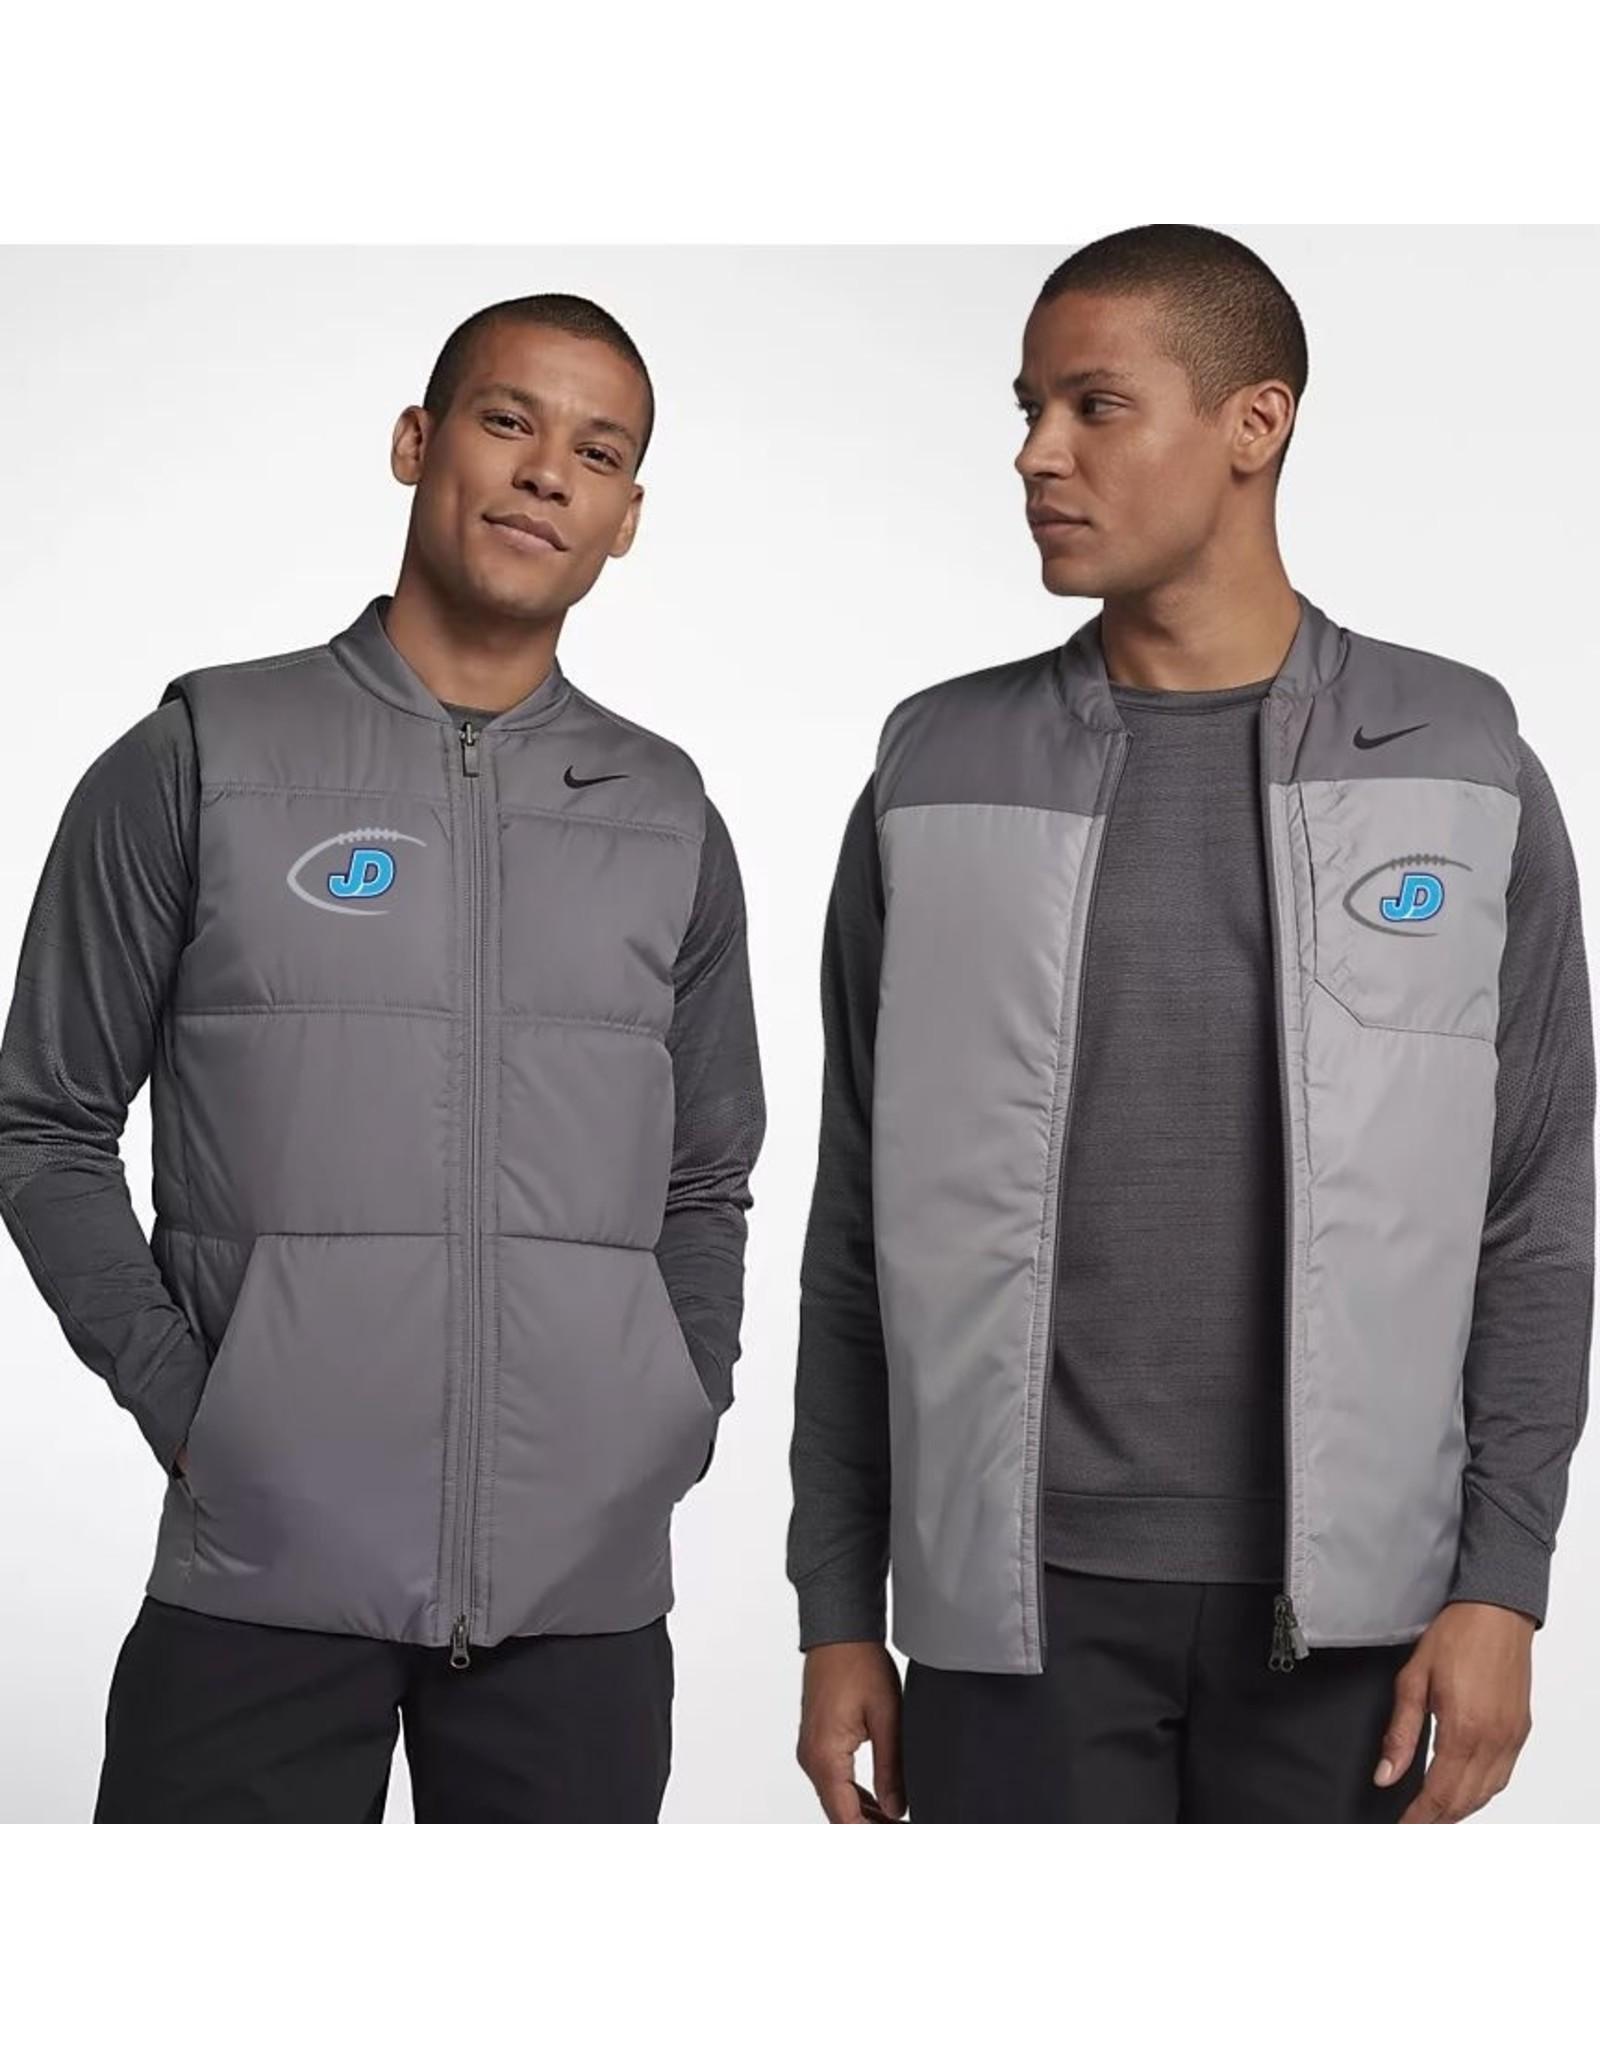 NON-UNIFORM Nike Football Unisex Reversible Vest